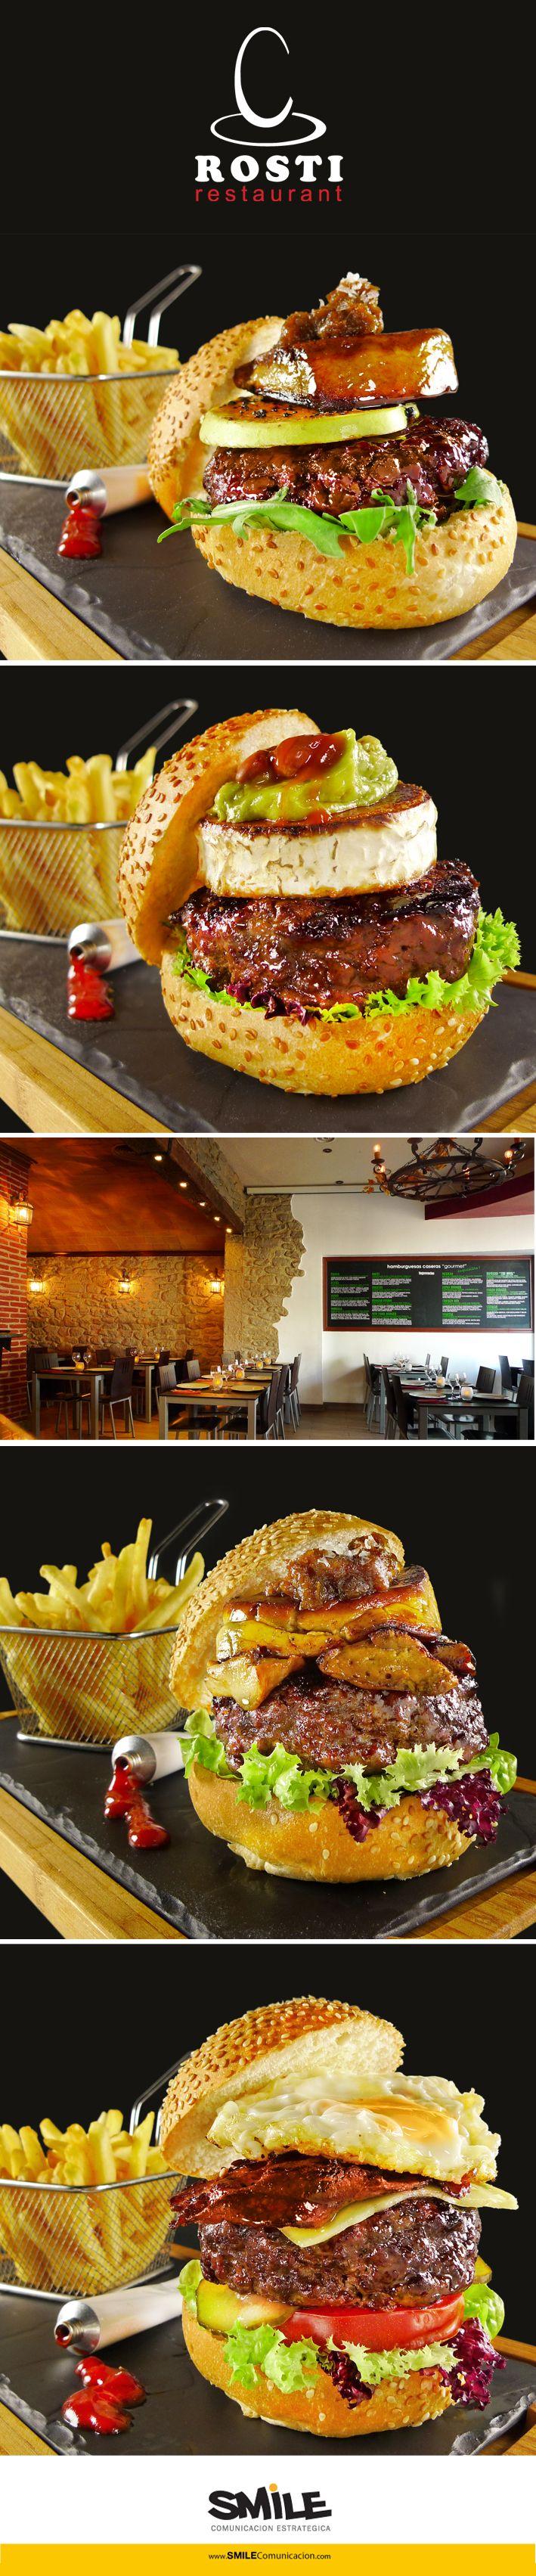 Fotografía de hamburguesas caseras gourmet | Homemade gourmet burger restaurant | healthy fresh food | Client: www.rosti.cat | Fecha: 2013.